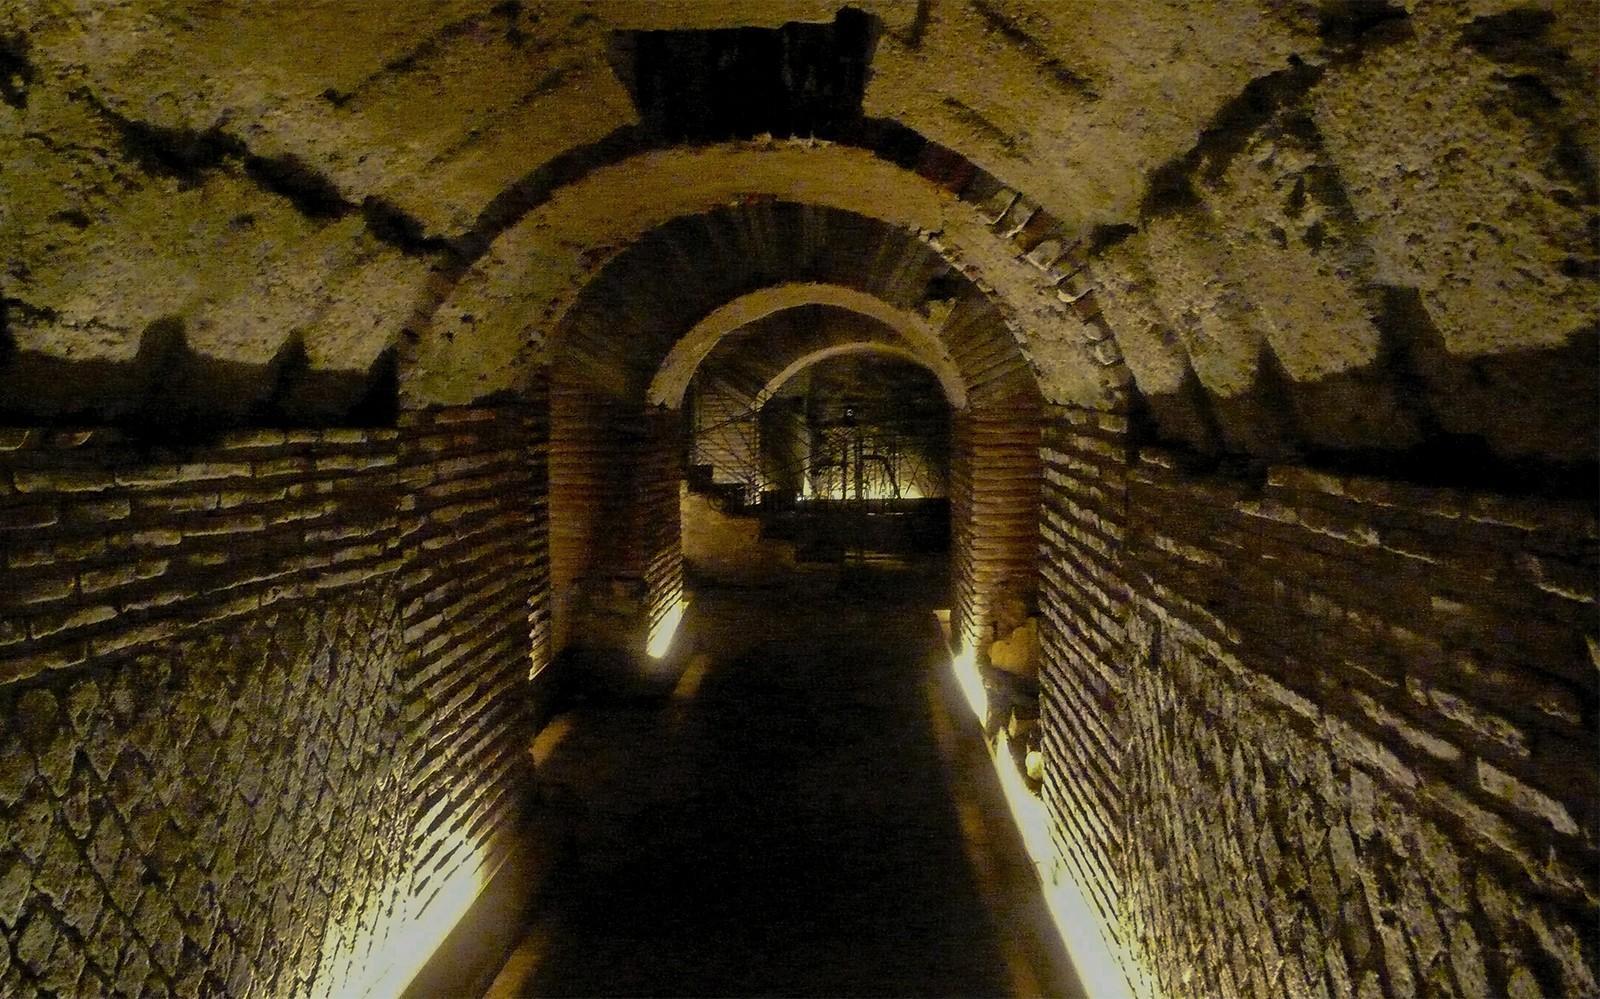 Napoli Sotterranea (Naples Underground)